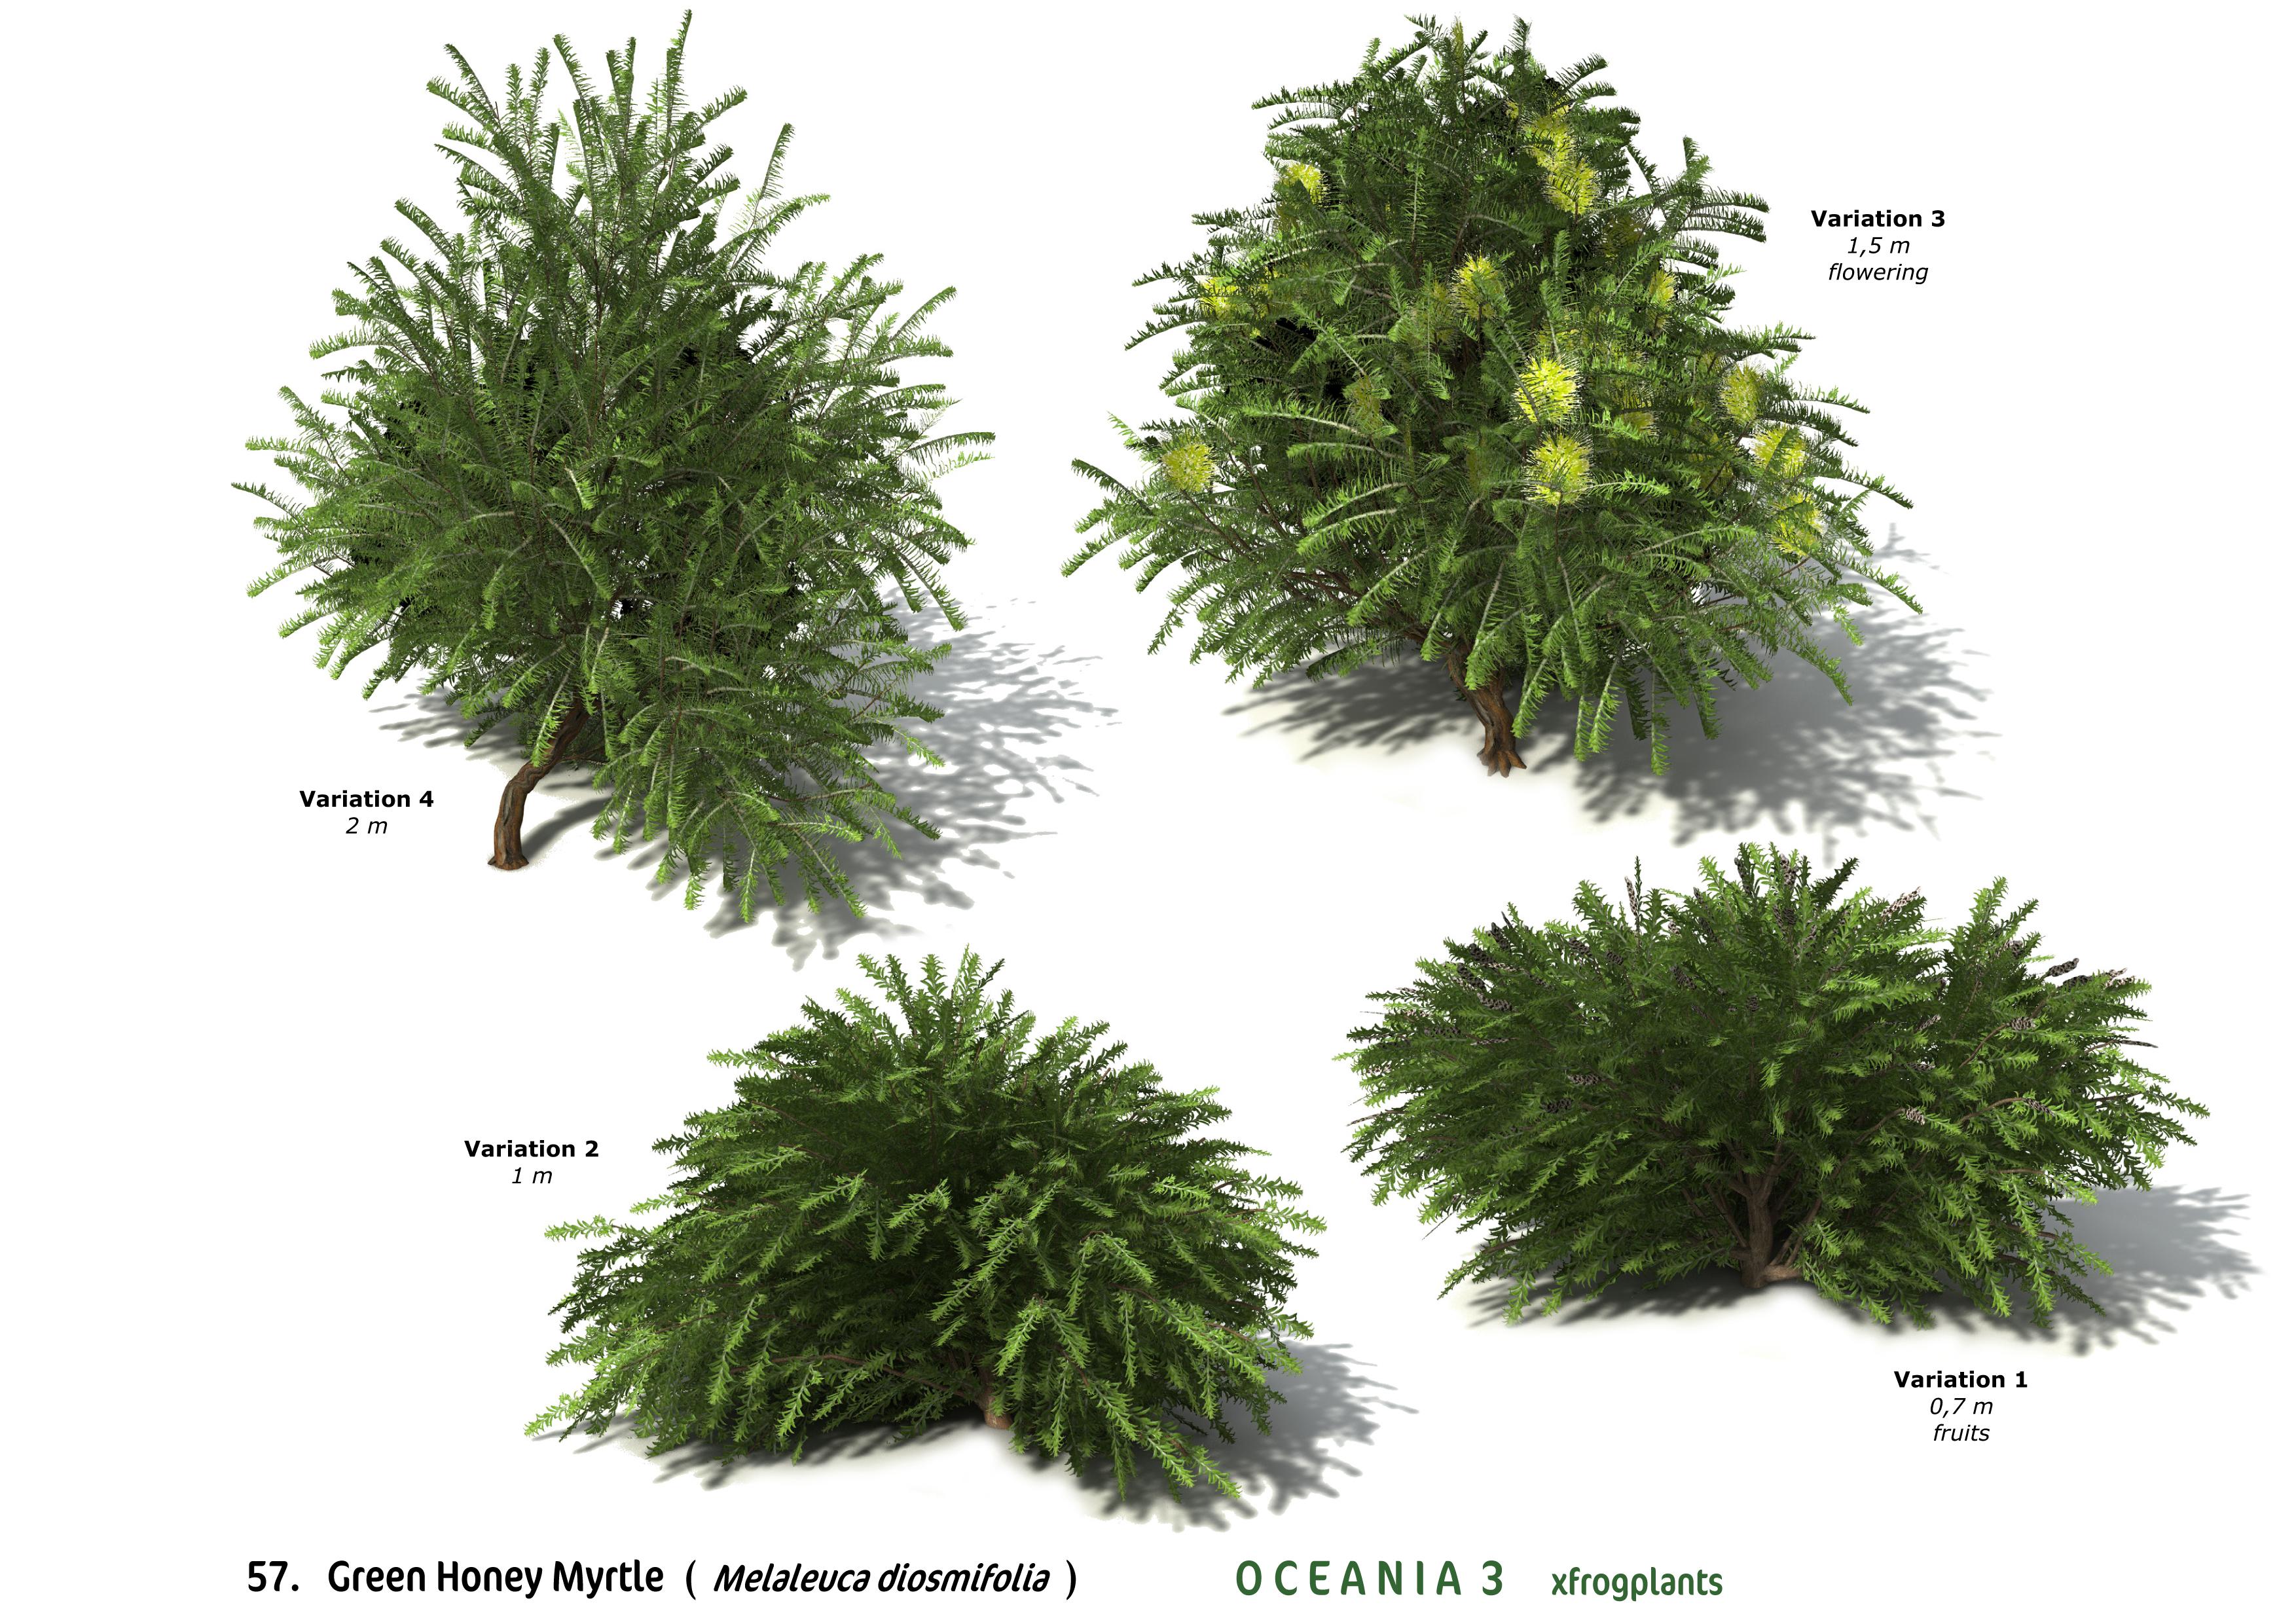 XfrogPlants Green Honey Myrtle : Xfrog.com